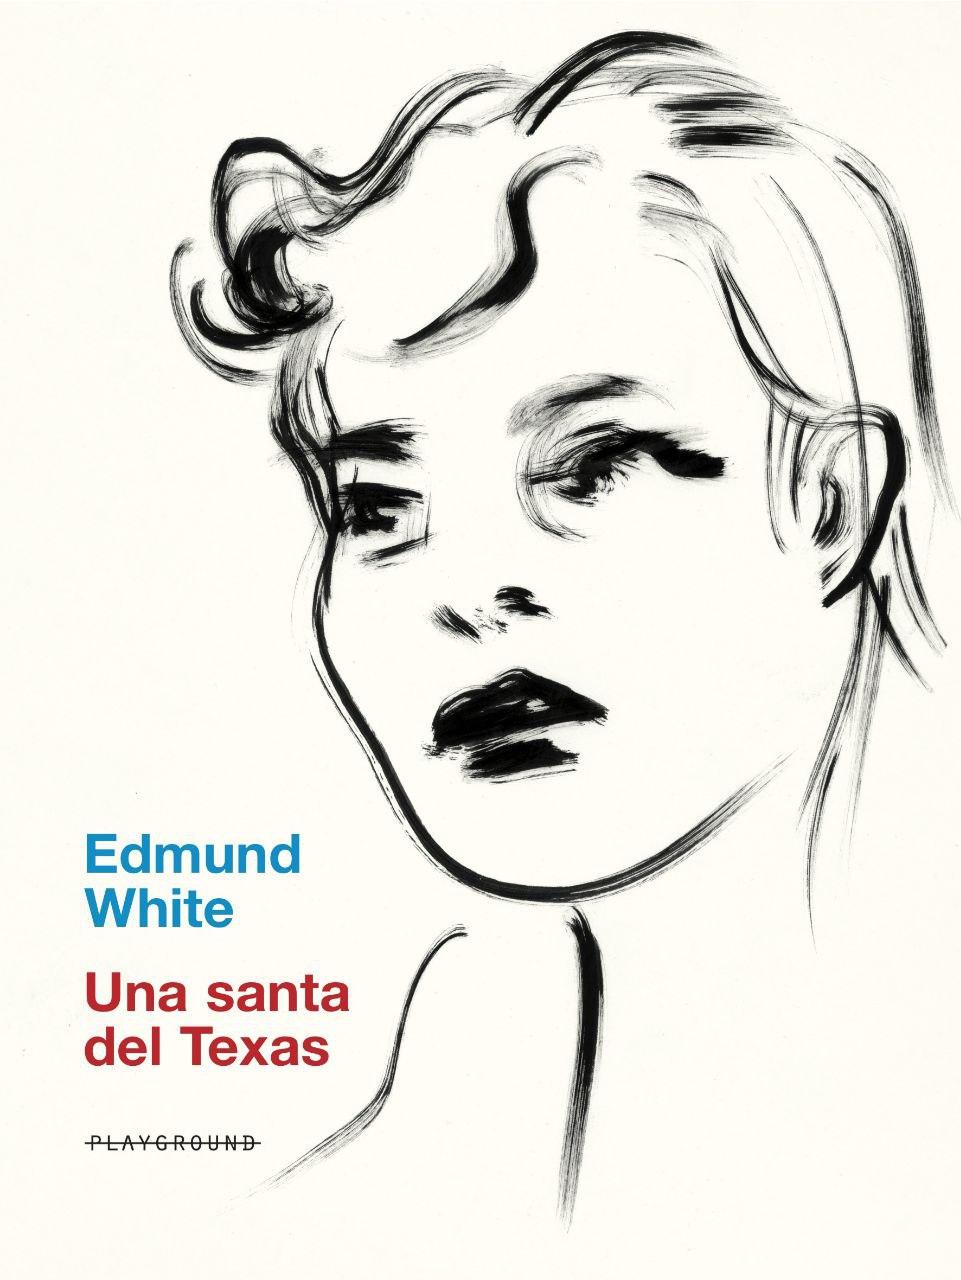 Una santa del Texas Edmund White